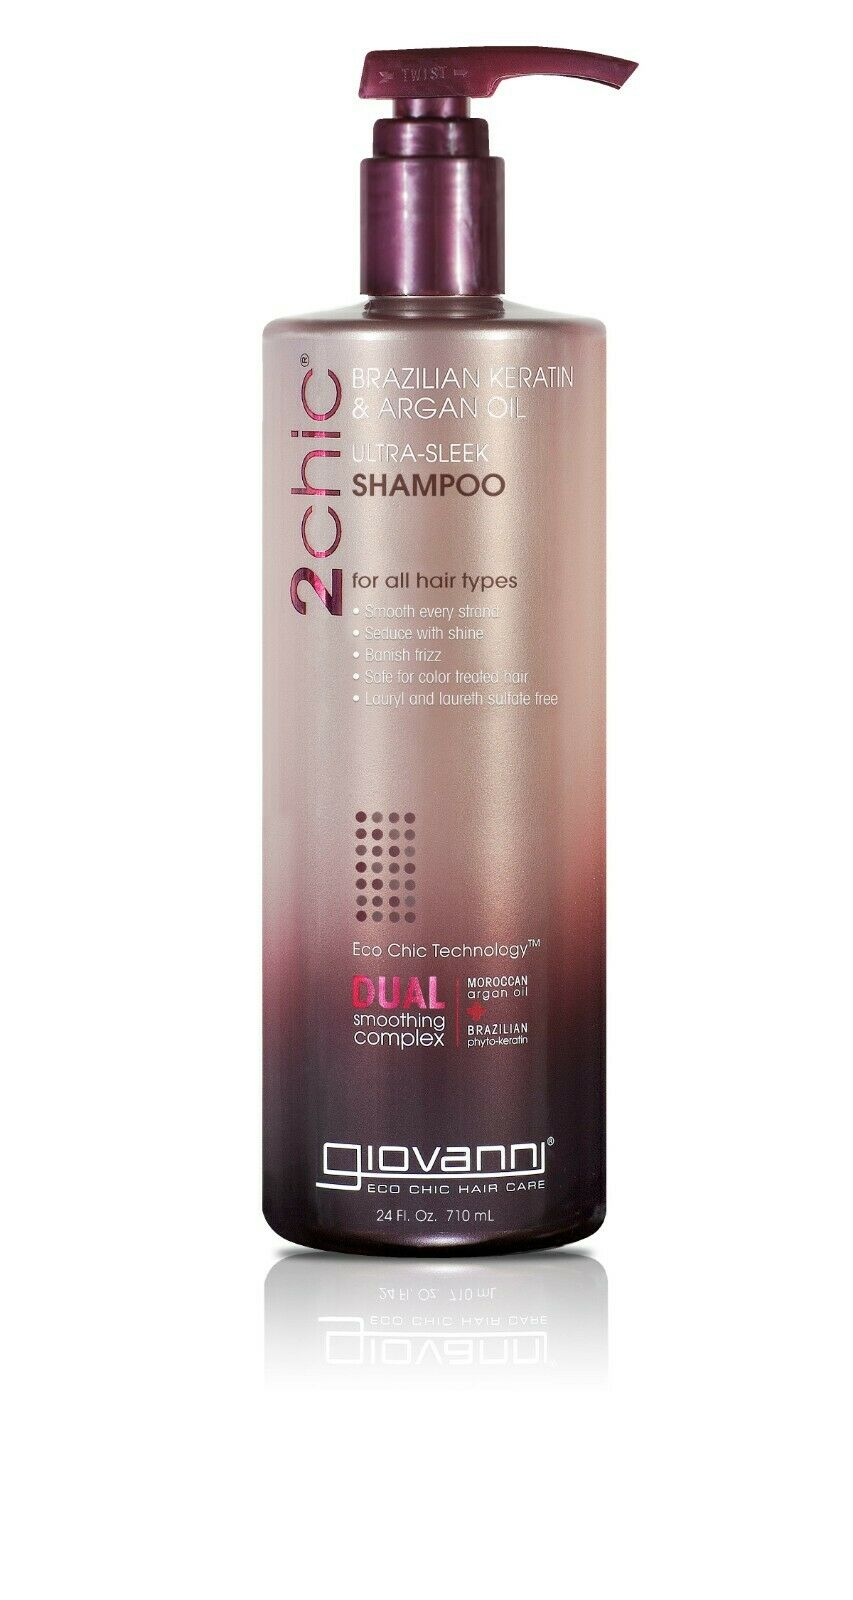 Giovanni 2Chic Brazilian Keratin and Argan Oil Ultra-Sleek S